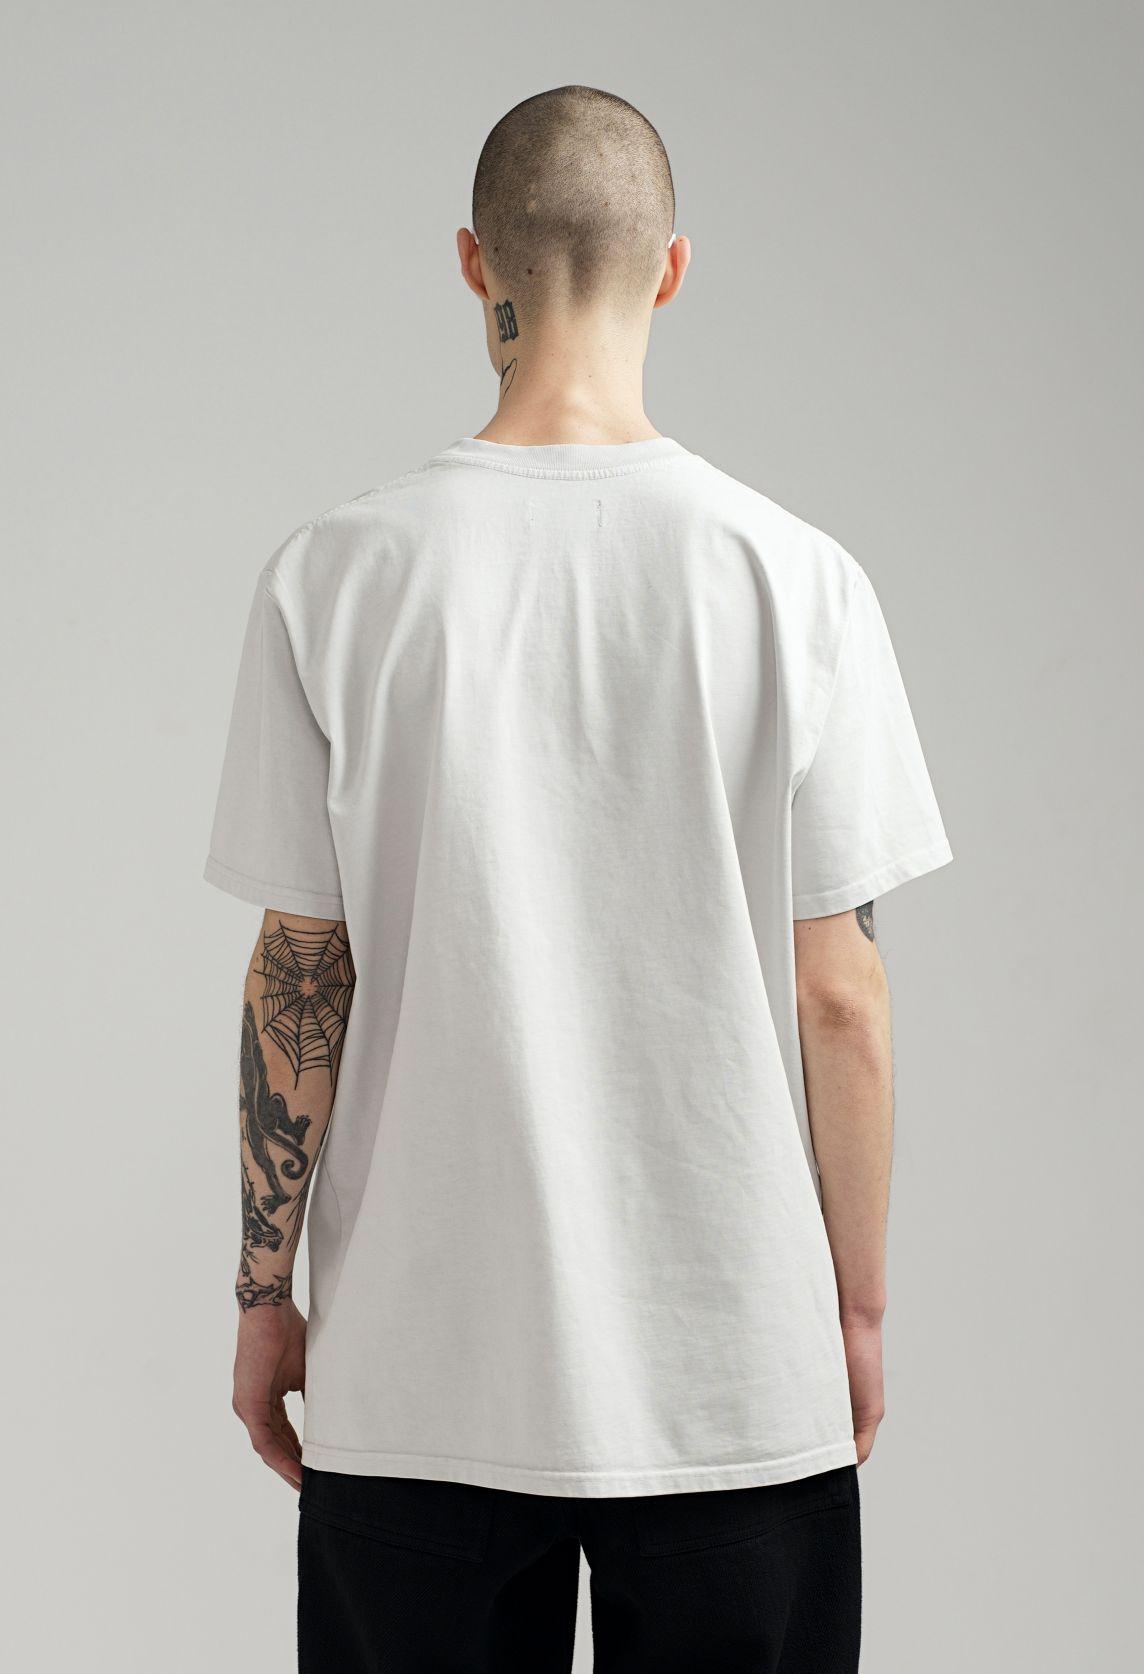 Ref Values T-Shirt